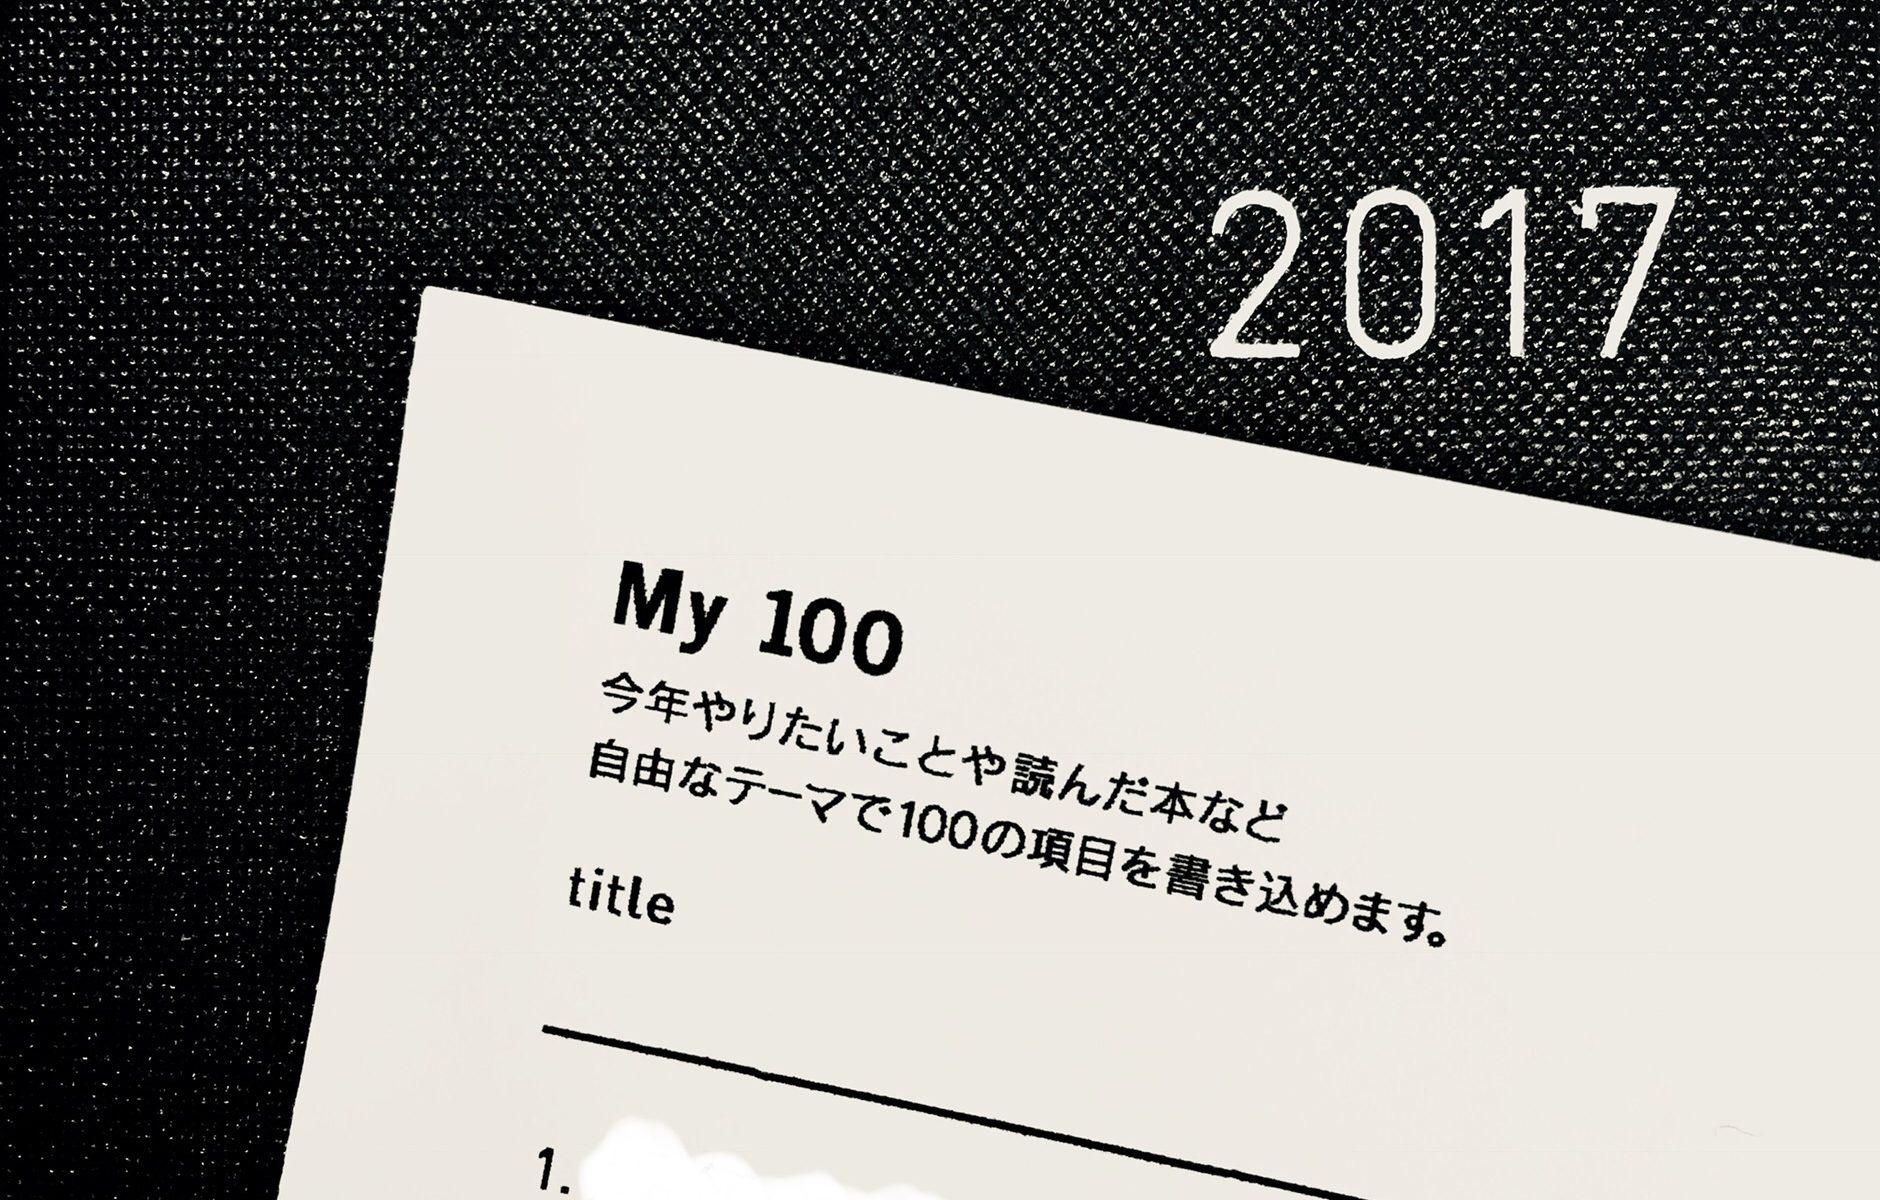 My100というリスト